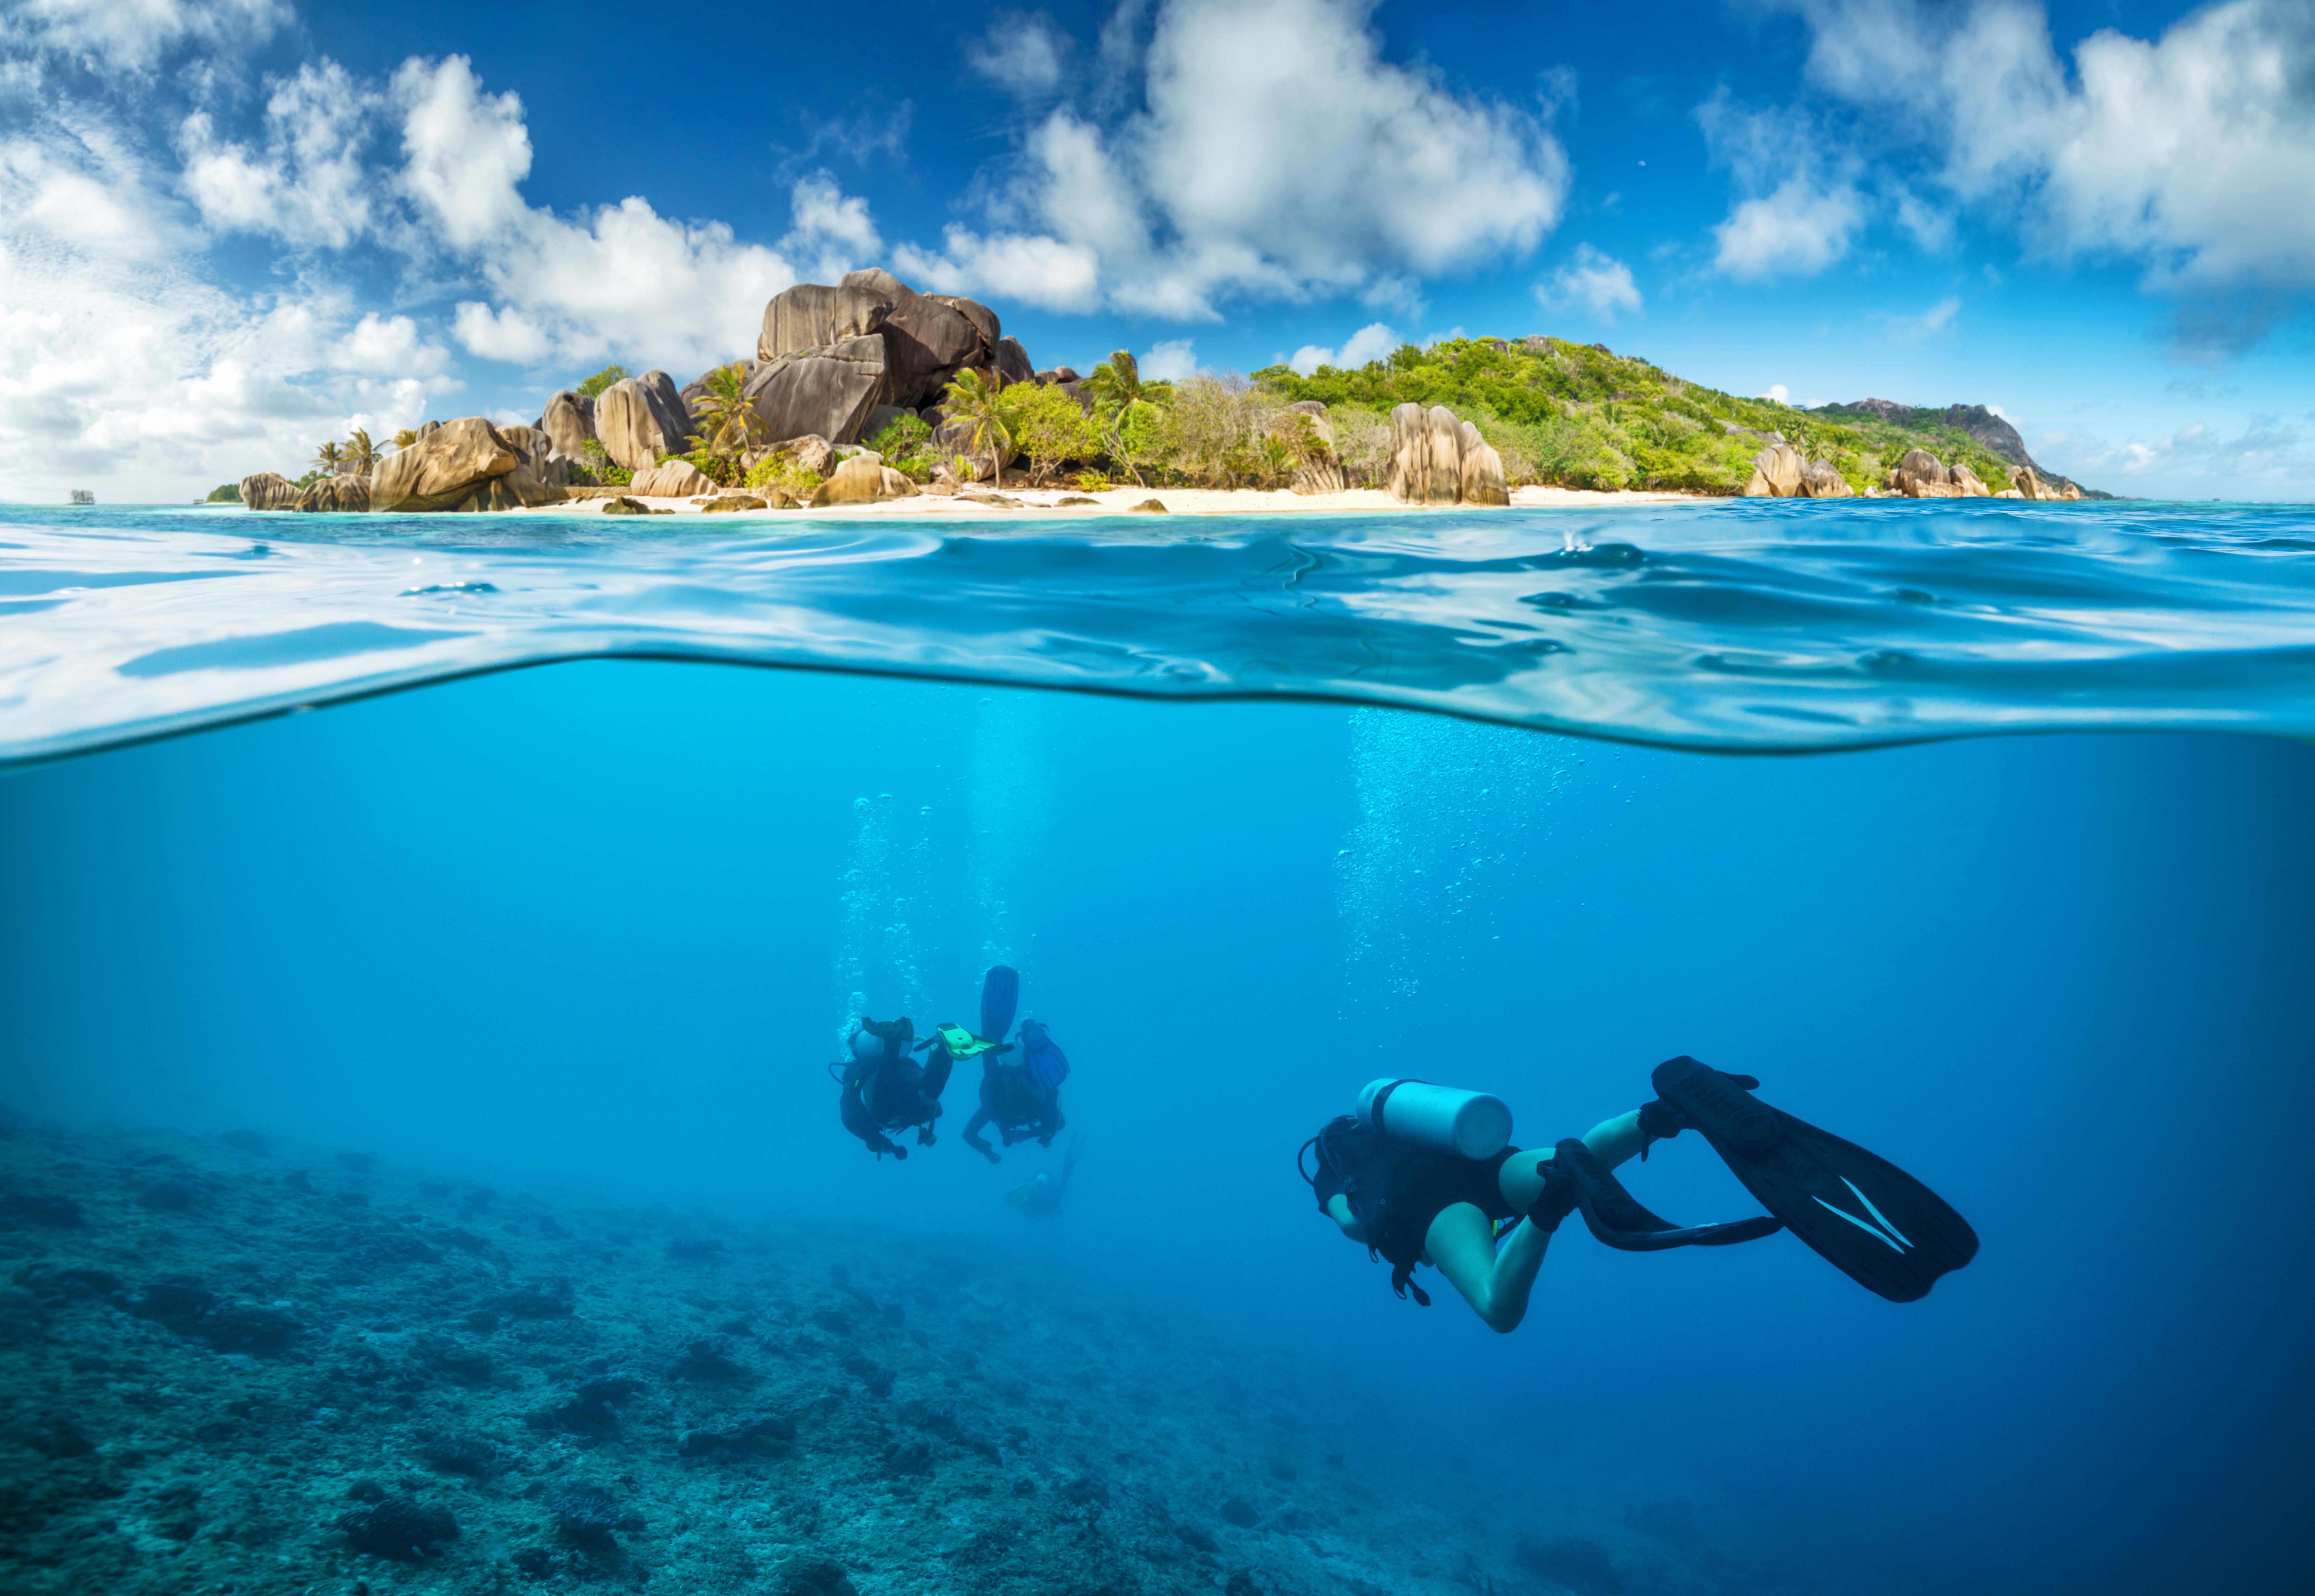 Wallpaper : landscape, sea, water, Pacific Ocean, blurred ... Pacific Ocean Water